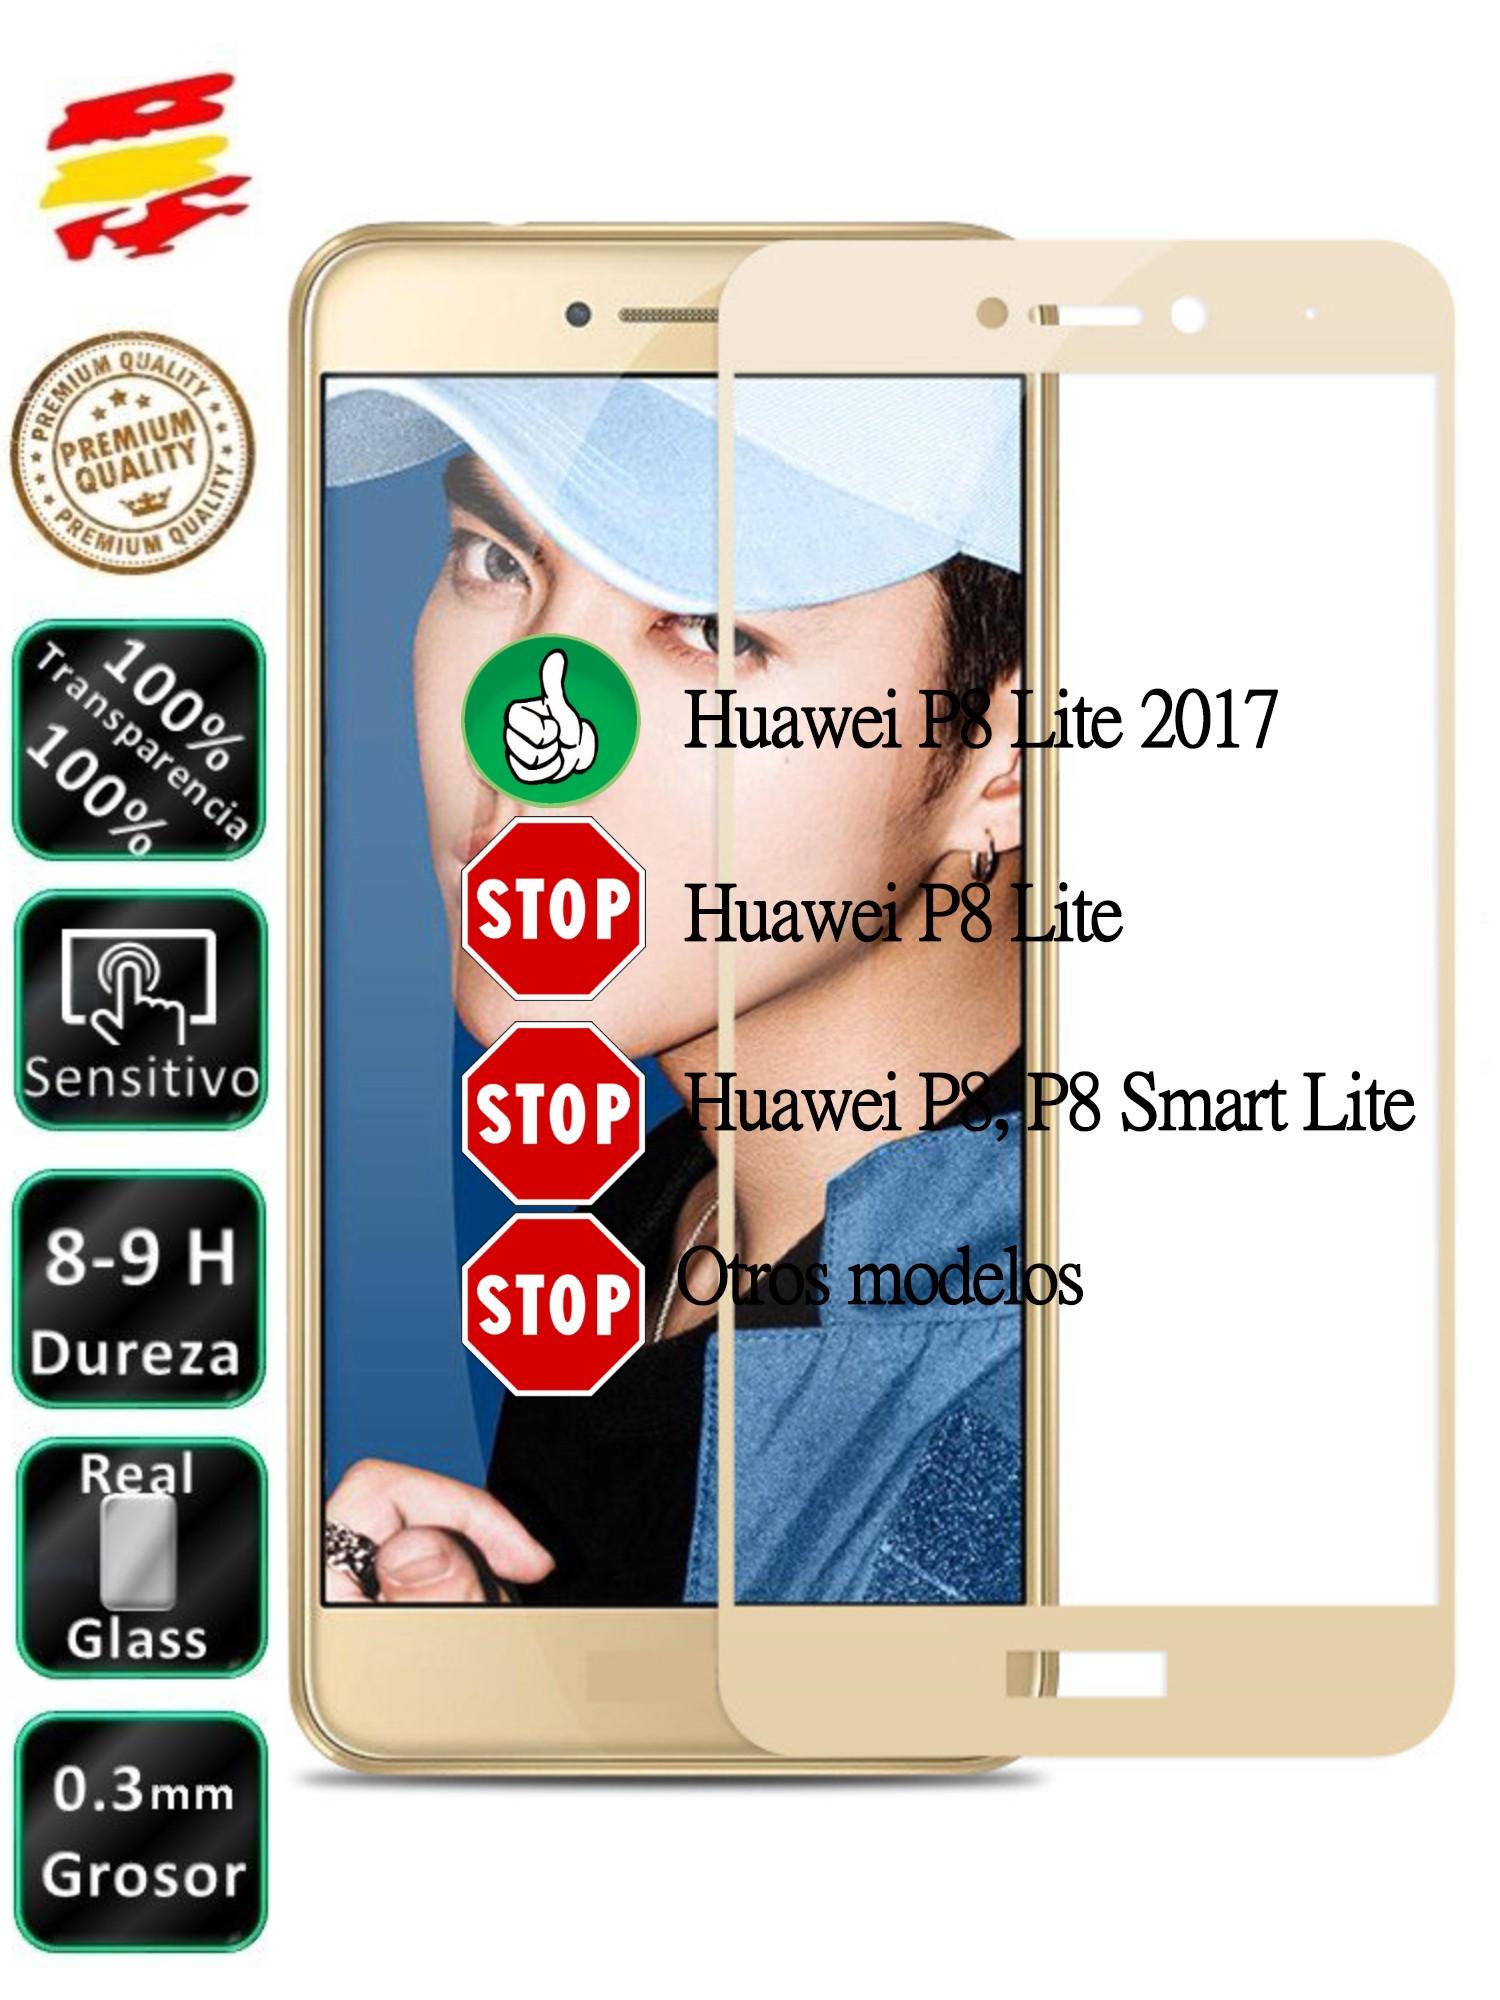 Protector Huawei P8 Lite 2017 Dorado Completo 3D Cristal Templado de Pantalla 3D HD vidrio templado para Apple Watch protector de pantalla Serie 3 2 1 42MM 38MM vidrio para Apple Watch cristal iwatch 5 4 44MM IWatch